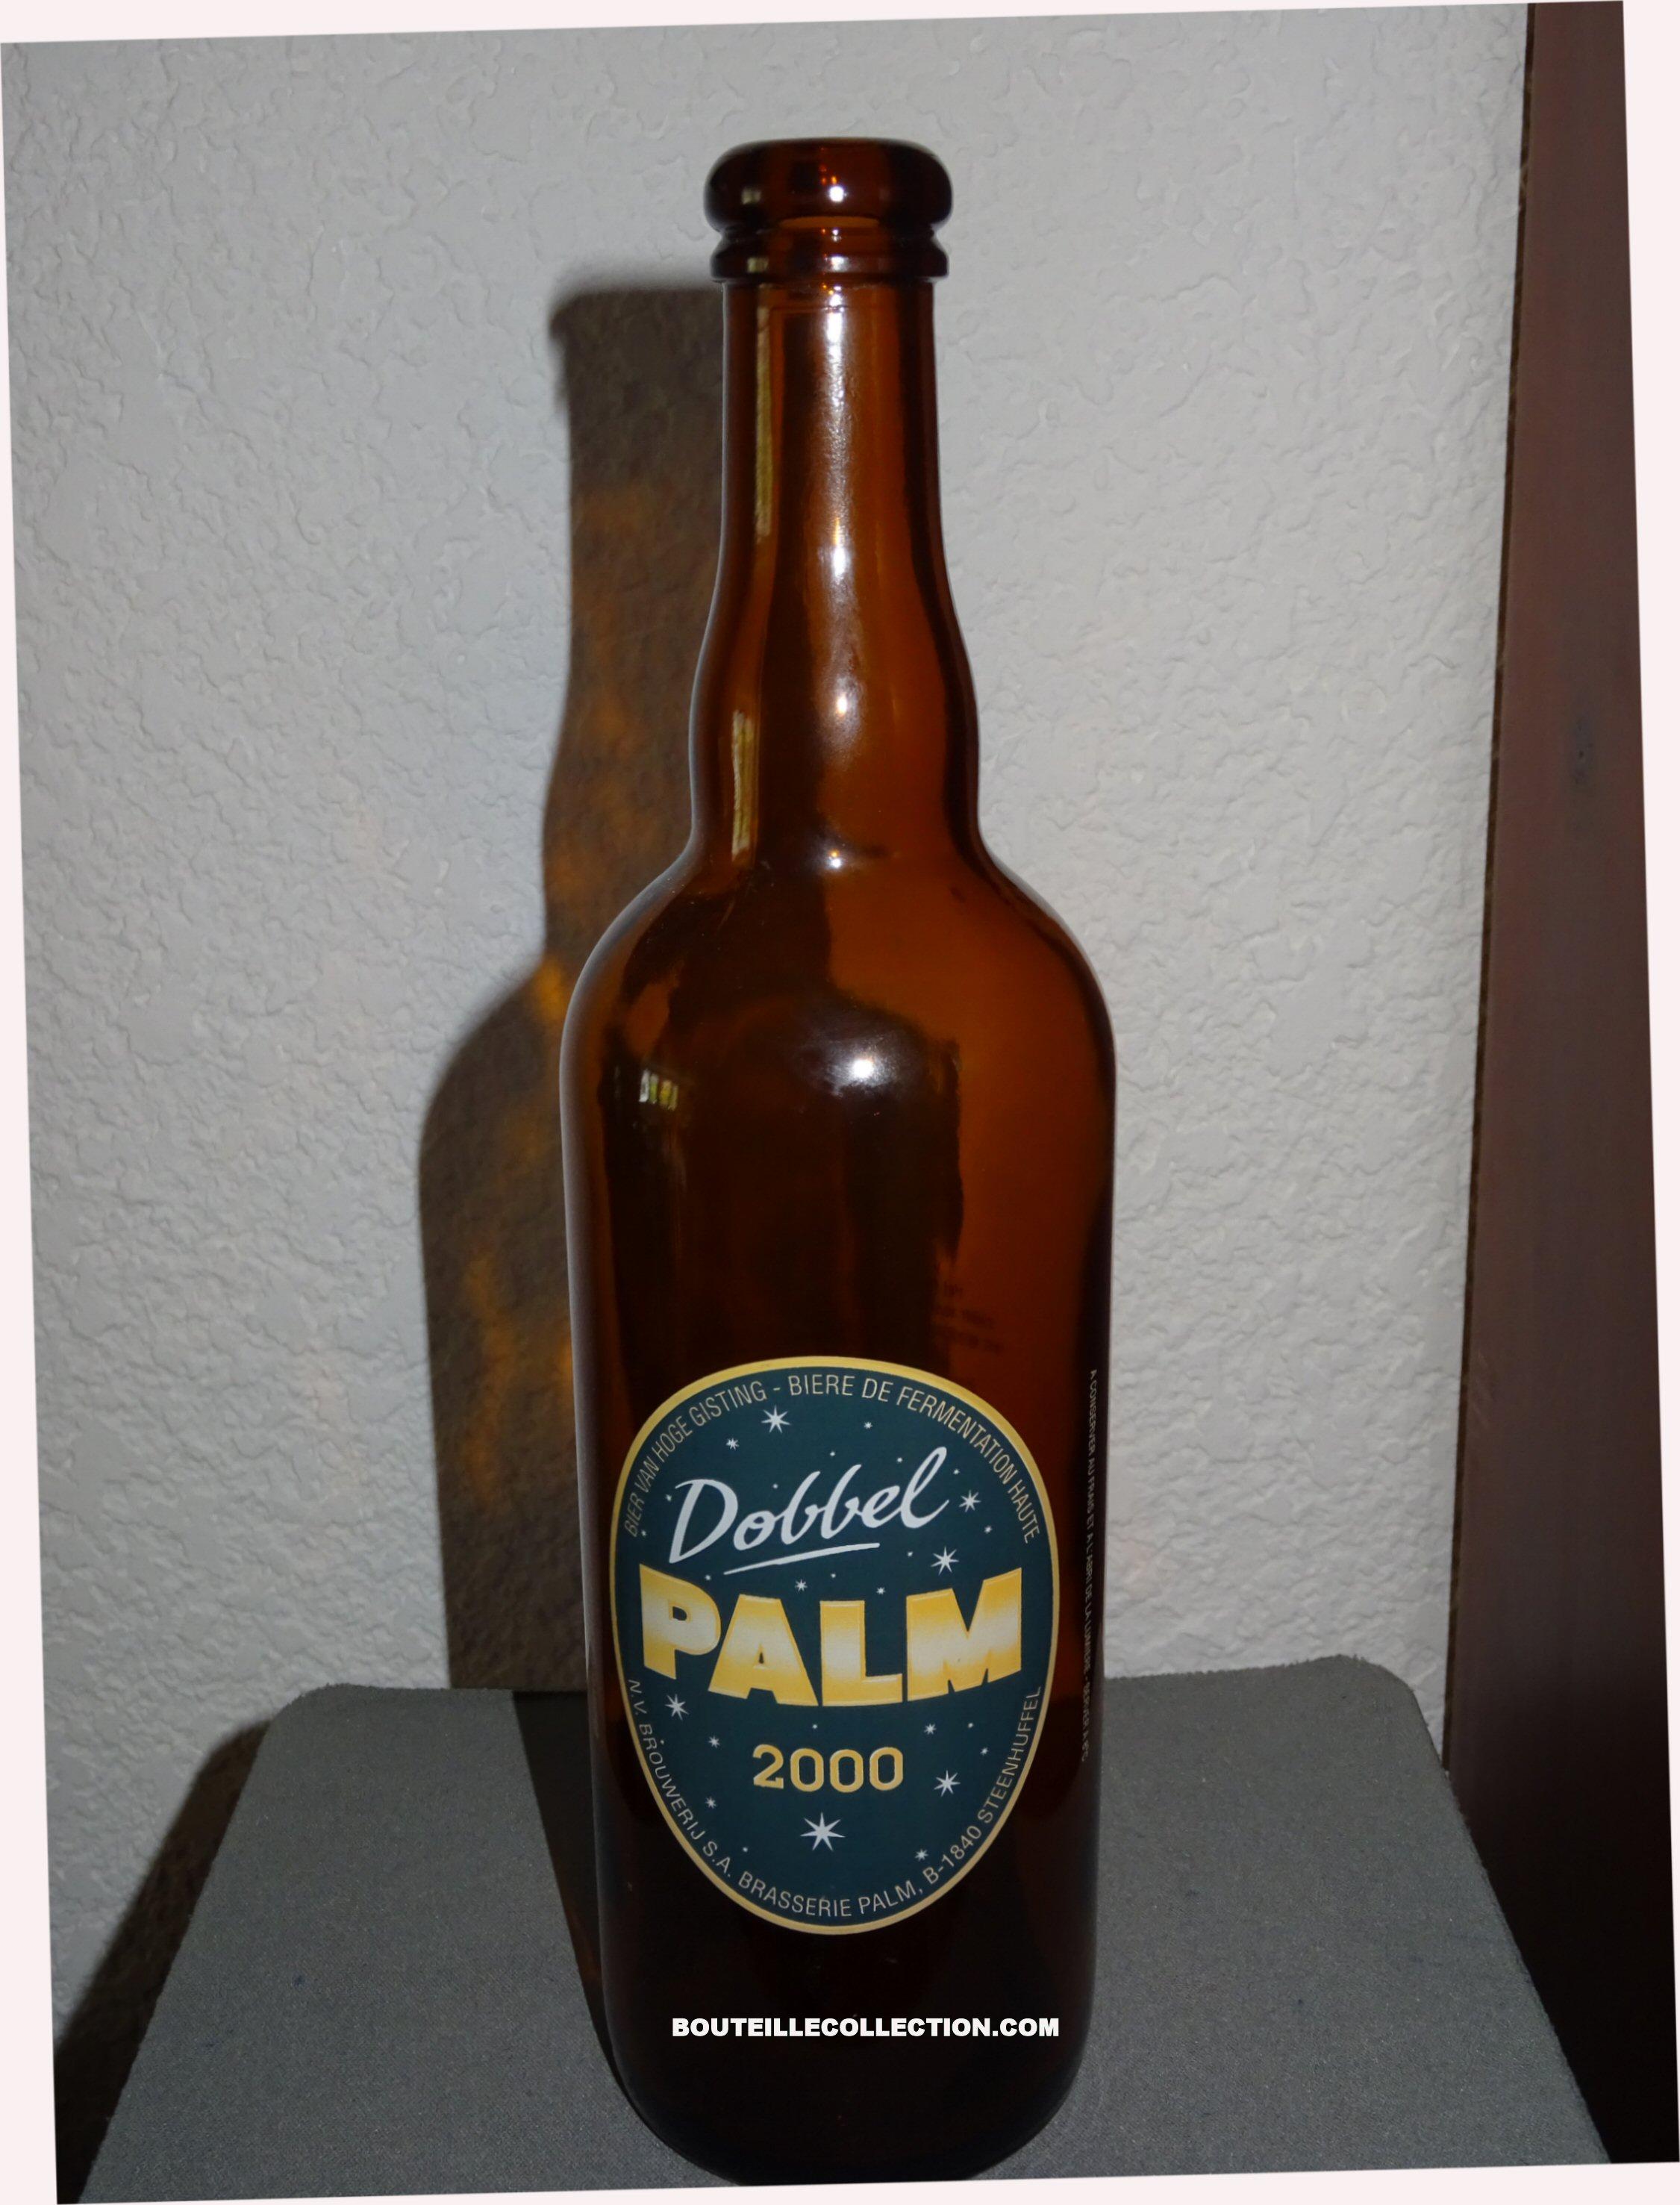 PALM DOBBEL 2000 75CL C .JPG